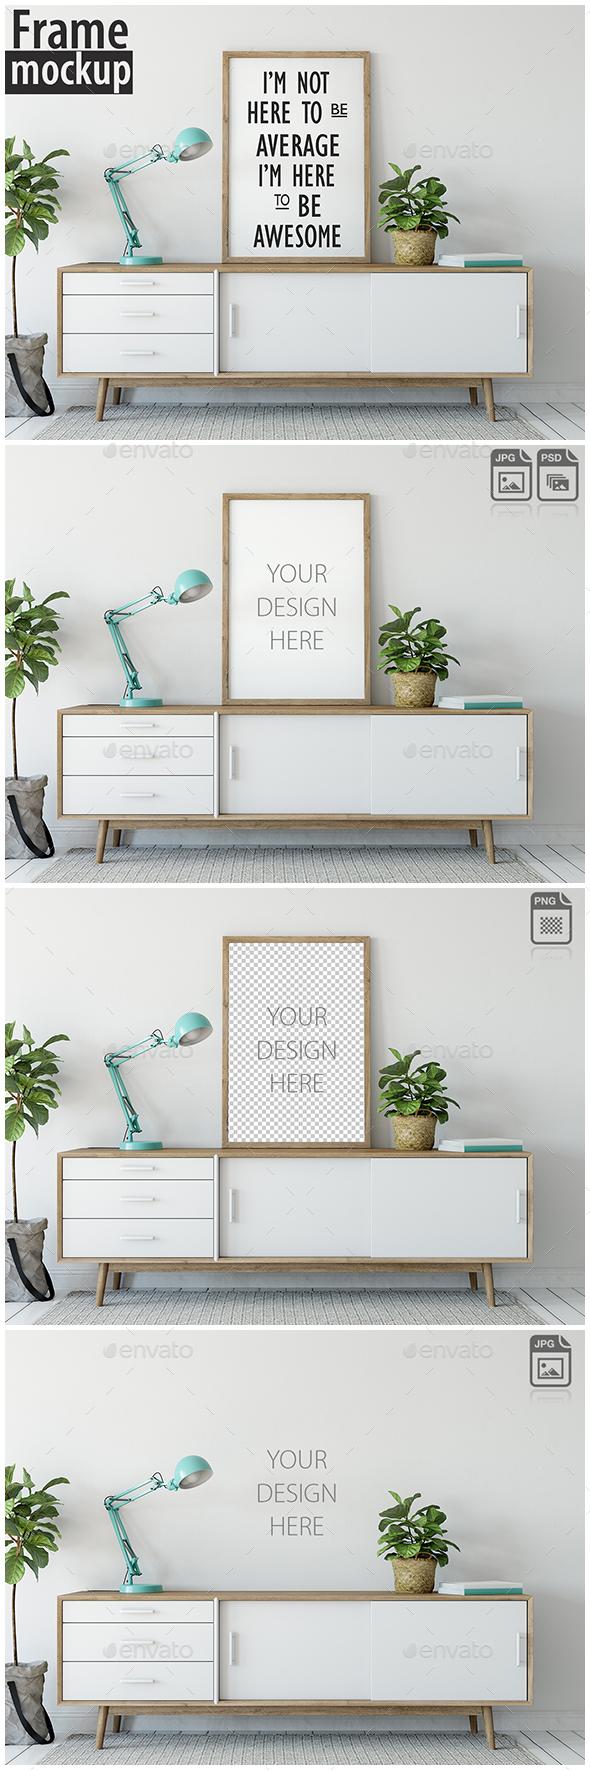 Frame Mockup_03 - Product Mock-Ups Graphics